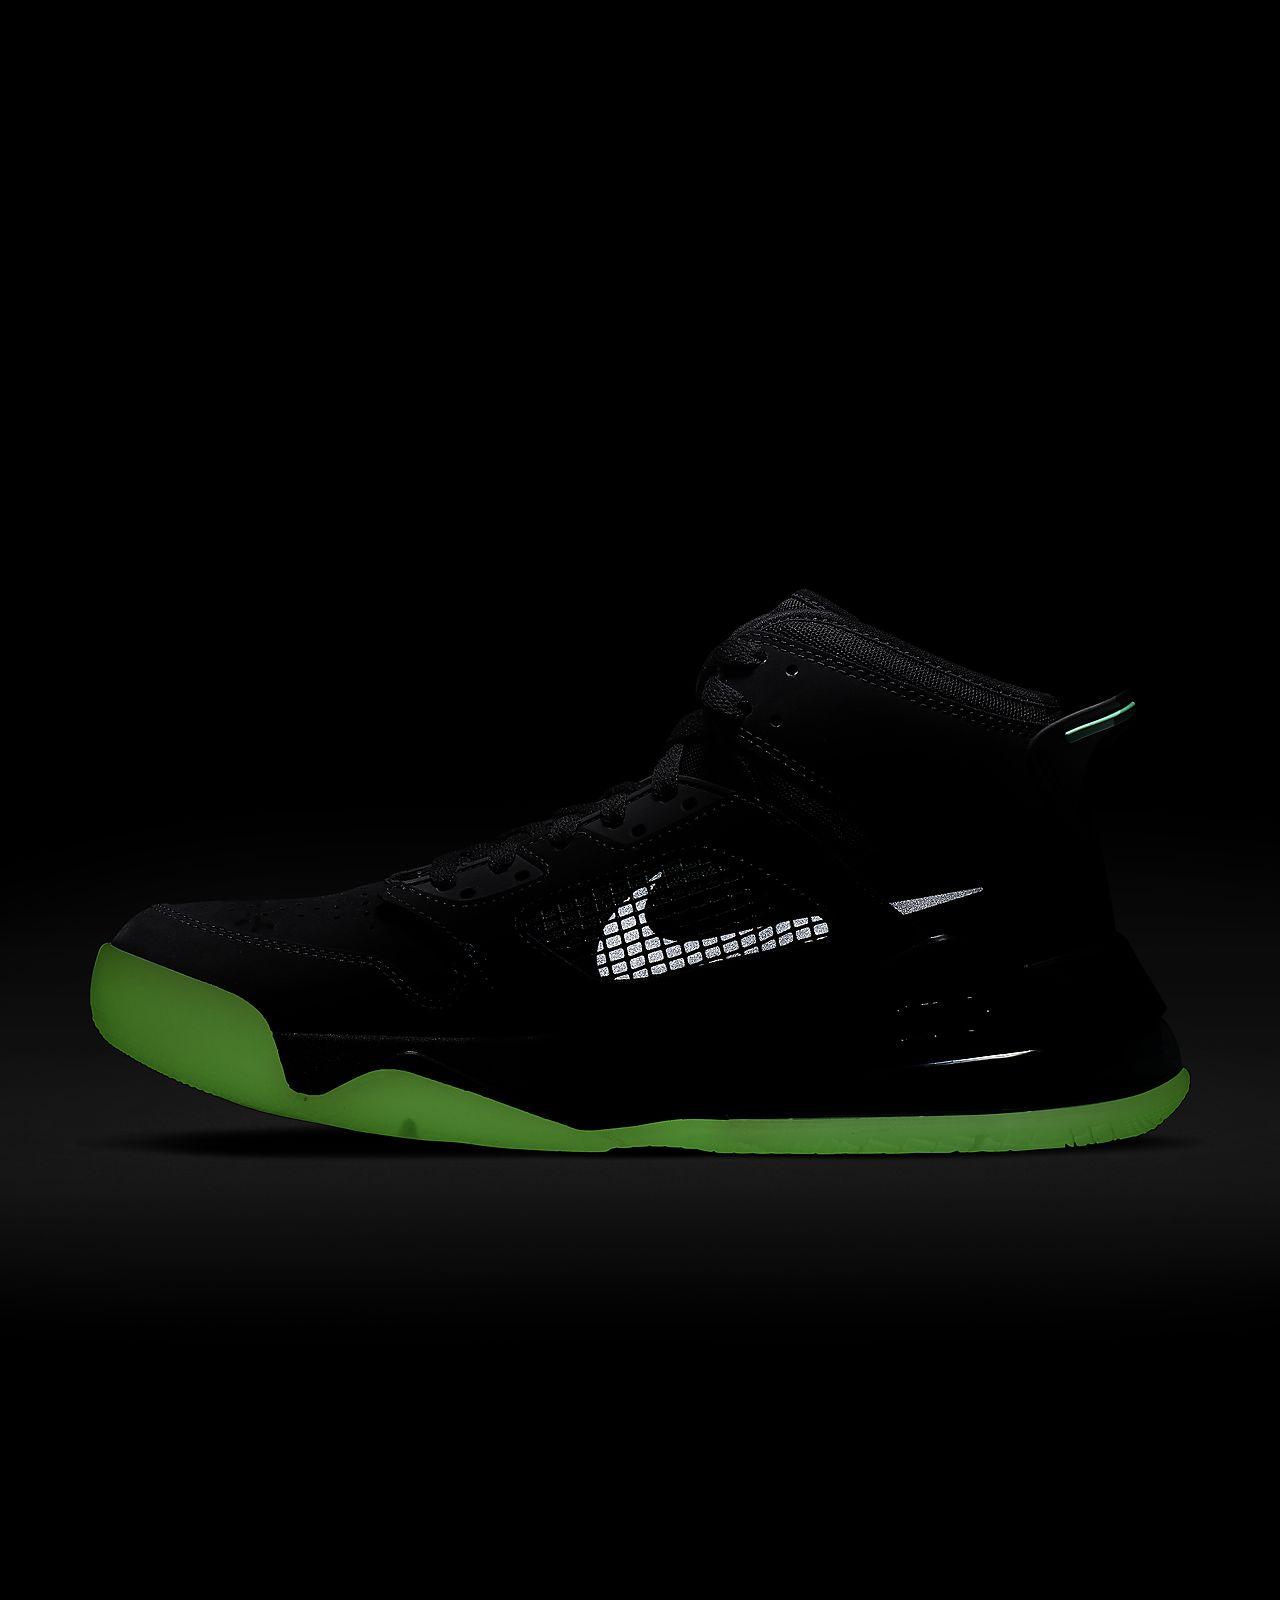 brand new 792a4 122db Jordan Mars 270 Men's Shoe